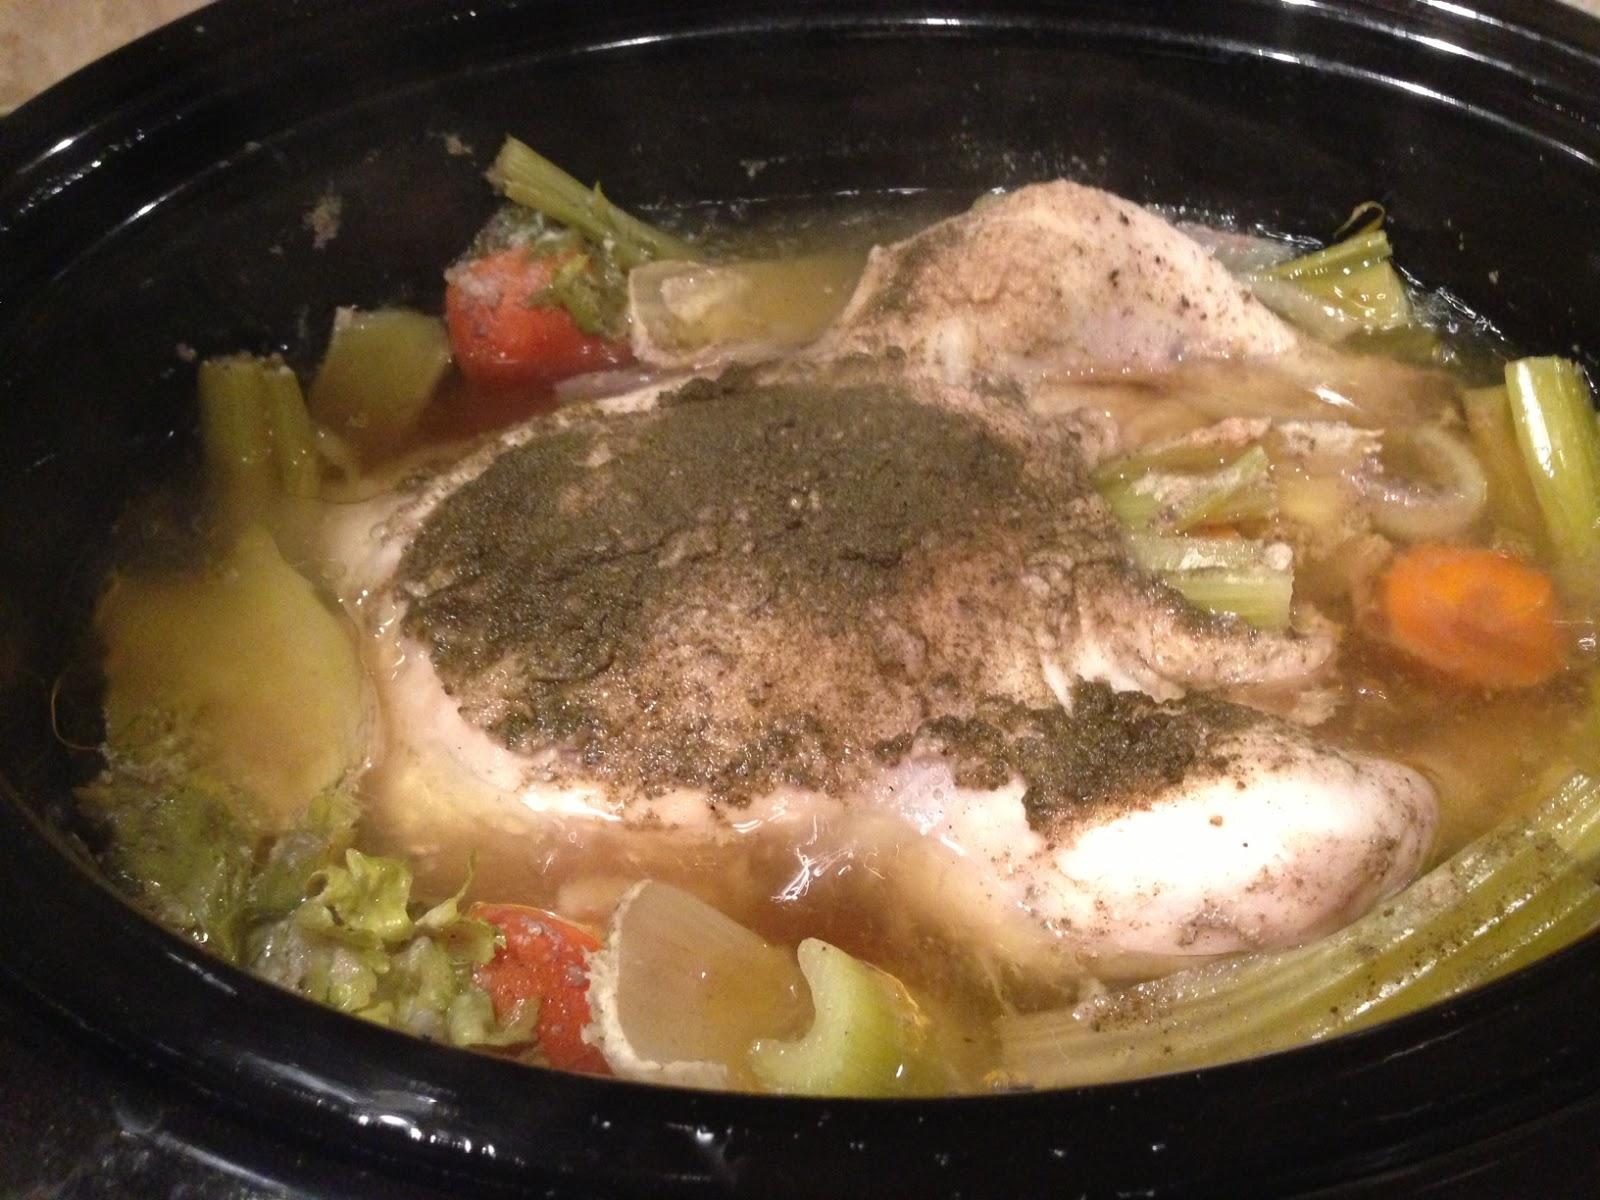 Whole Chicken In Crock Pot On Low